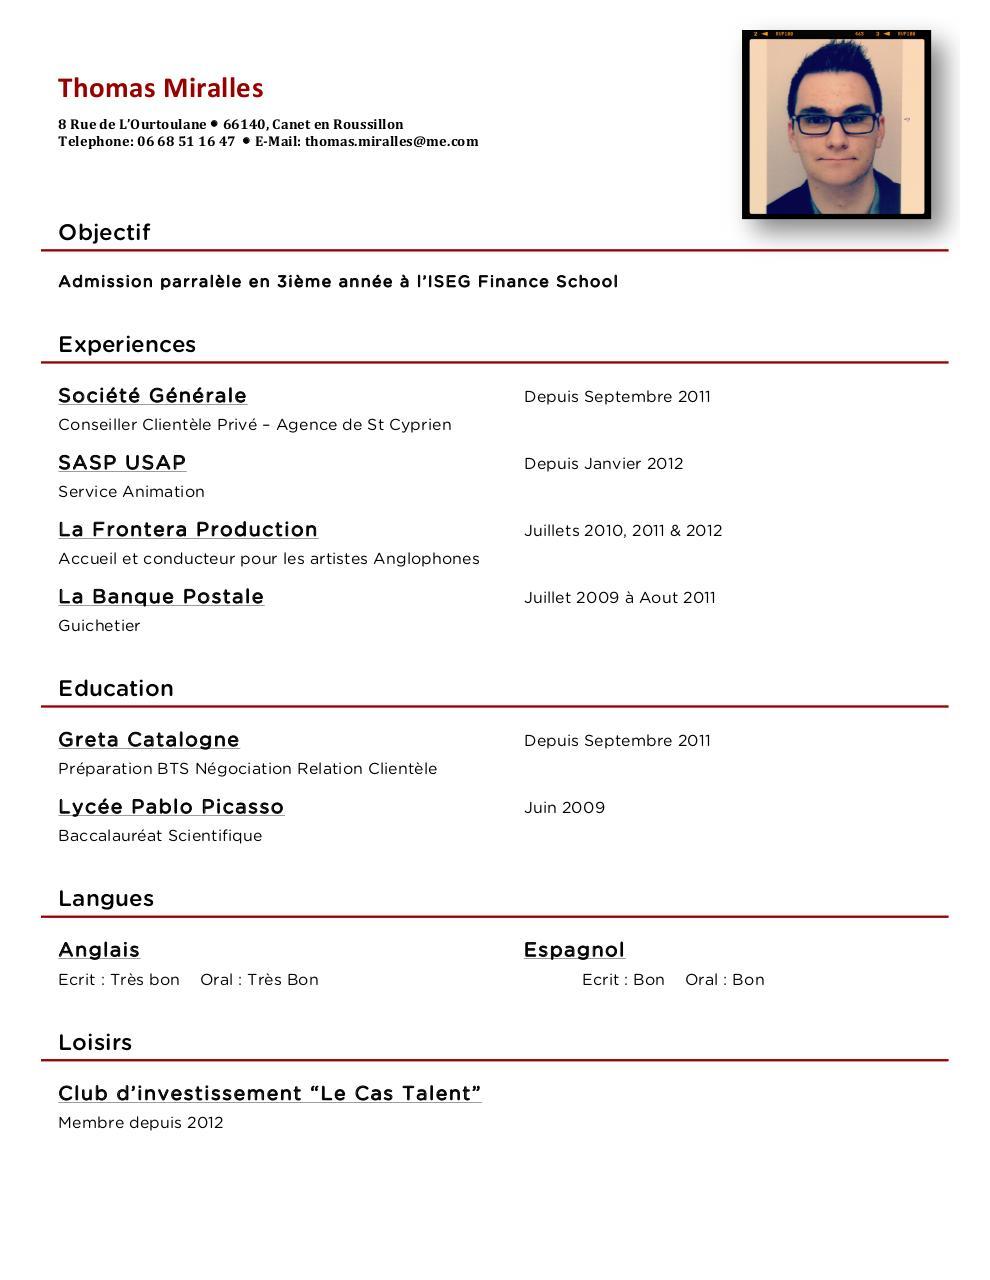 cv 2013 docx par thomas miralles - cv 2013 pdf